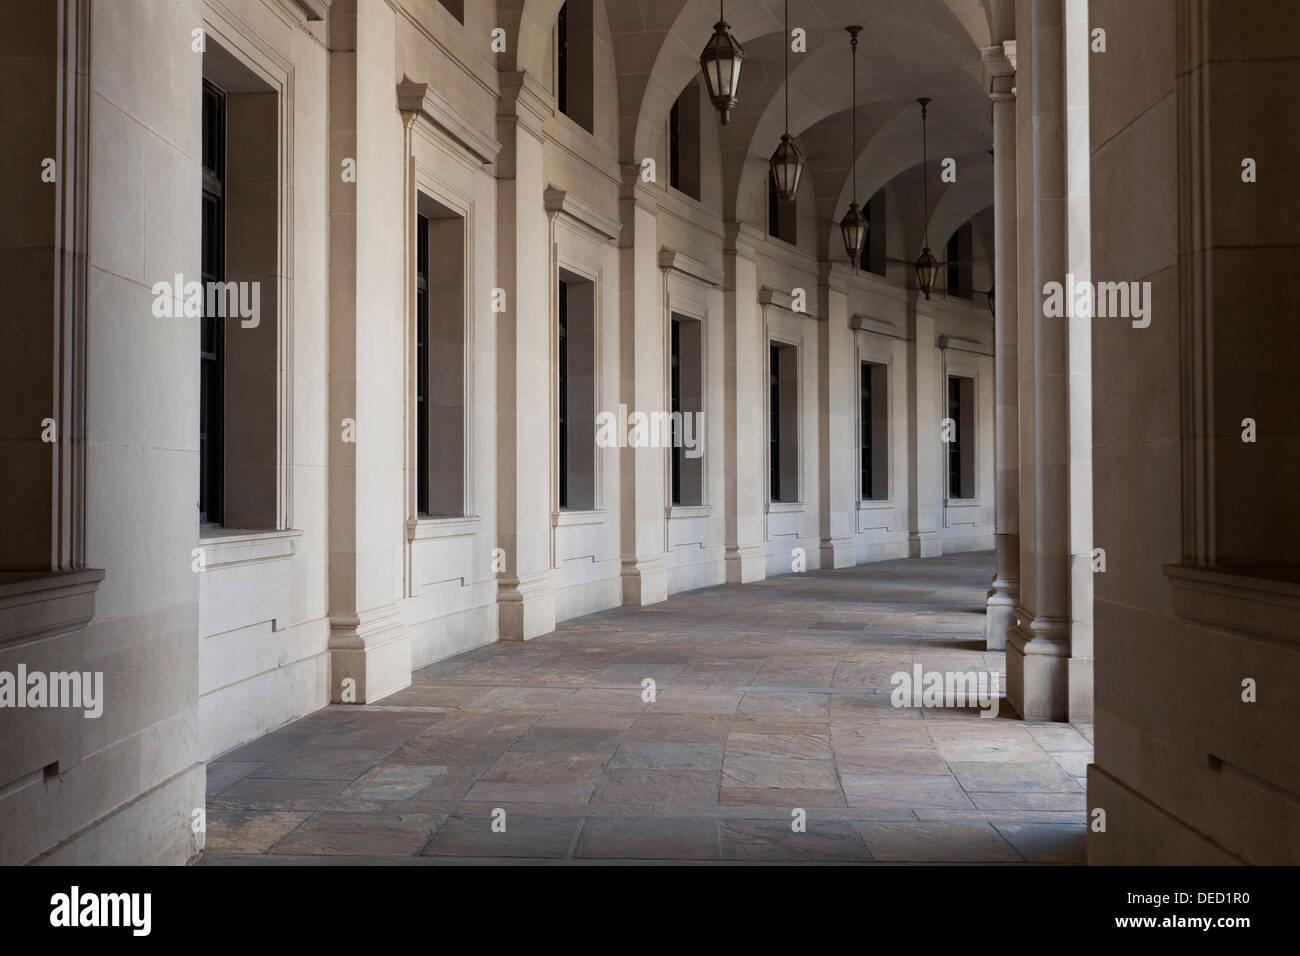 William Jefferson Clinton Federal building (old Ariel Rios building) hall columns - Washington, DC USA - Stock Image